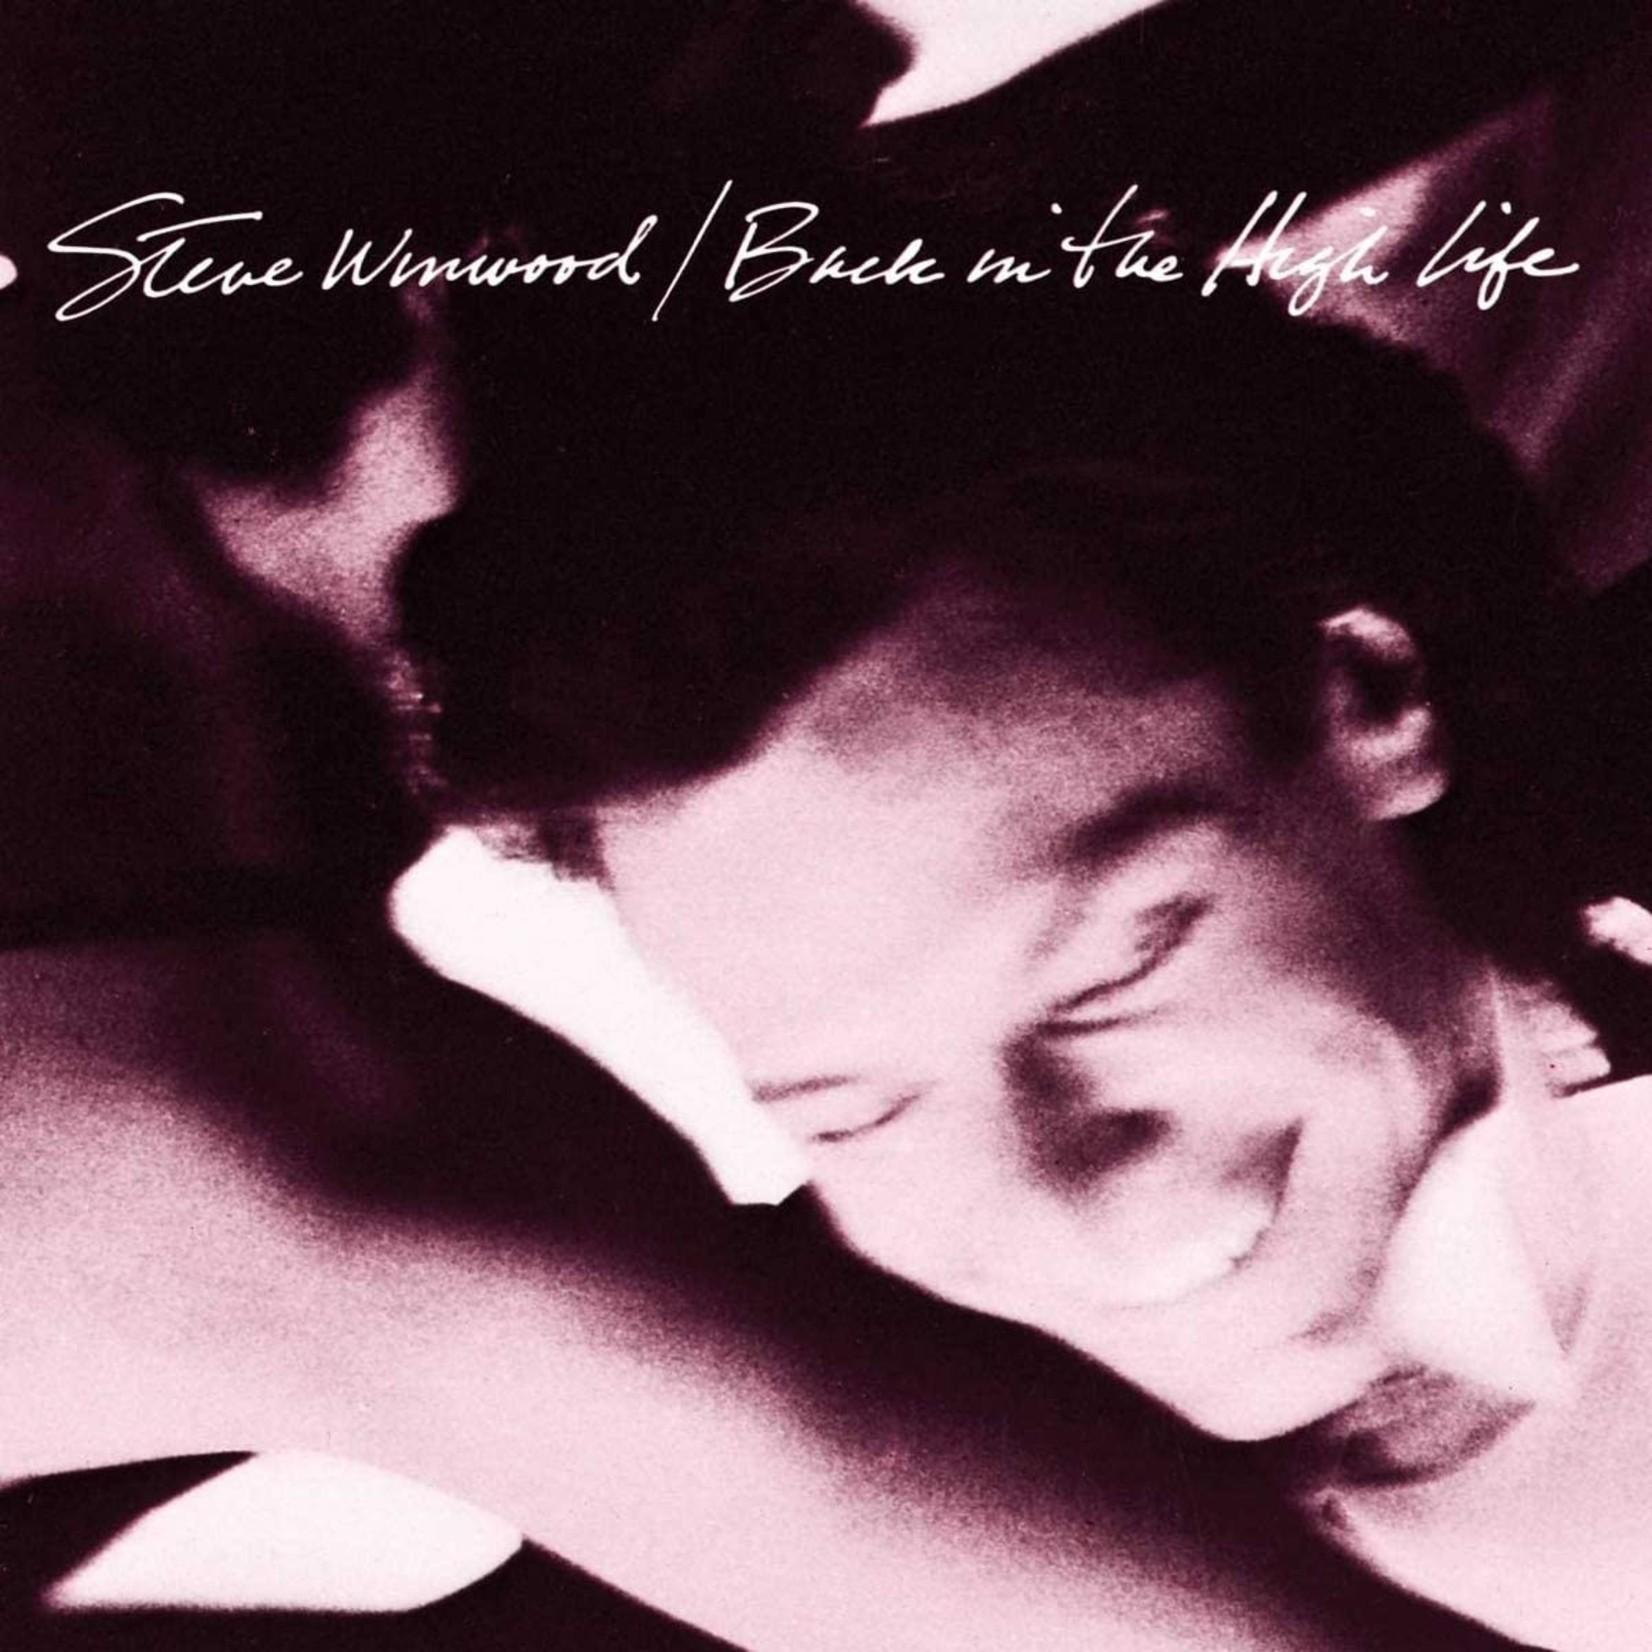 [Vintage] Winwood, Steve: Back in the High Life